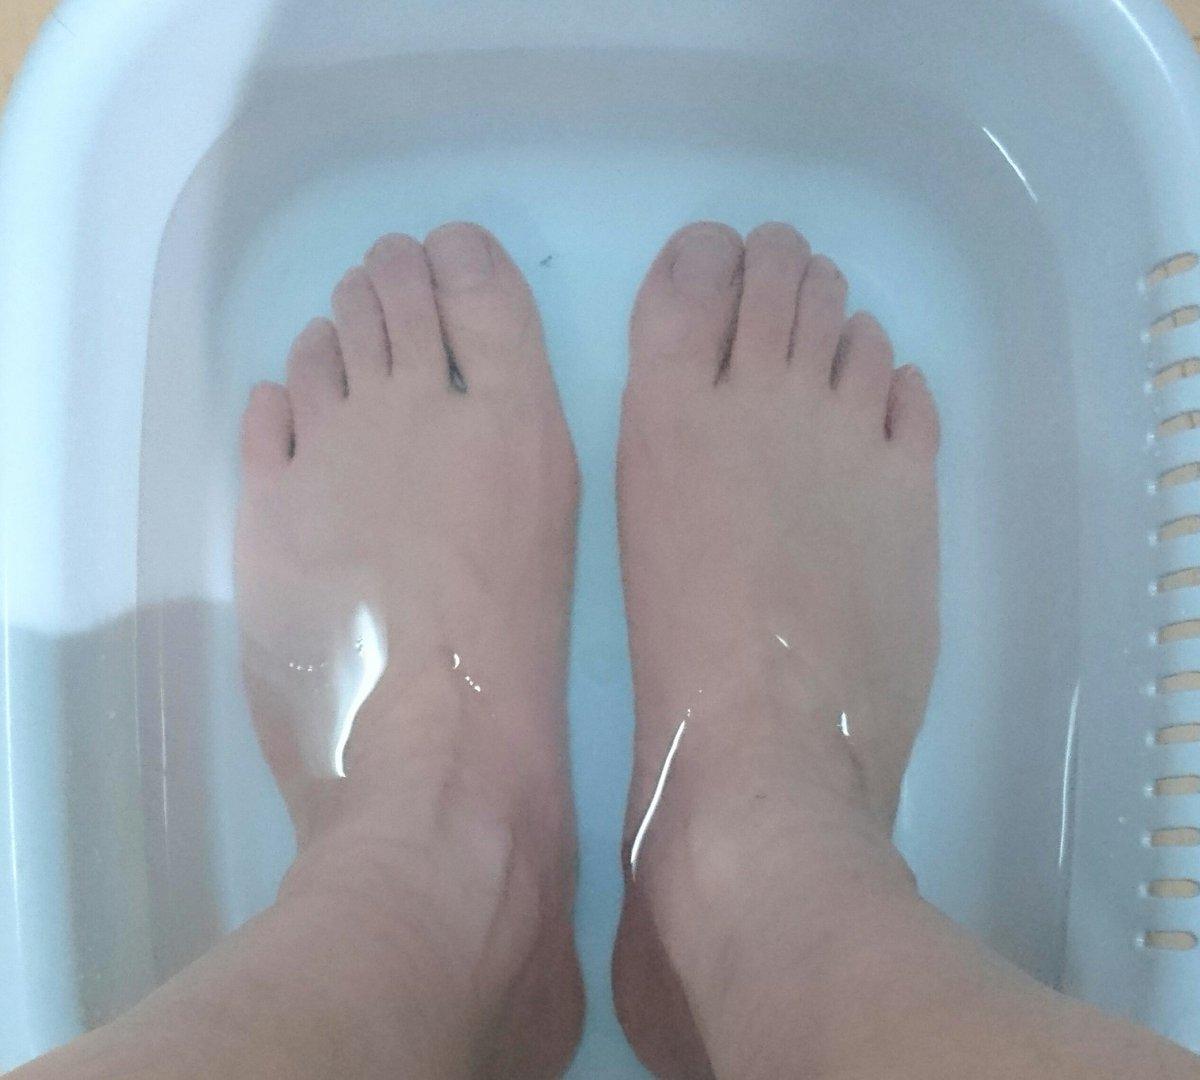 test ツイッターメディア - 今日も歩き疲れたので帰宅してからコーヒー飲みながら、自宅で足湯。100円ショップ キャンドゥで見つけた台所用の6.5Lの洗い桶。余裕で両足が入ります。安上がりで快適。 #自宅で足湯  #キャンドゥ https://t.co/pAMka15hhi